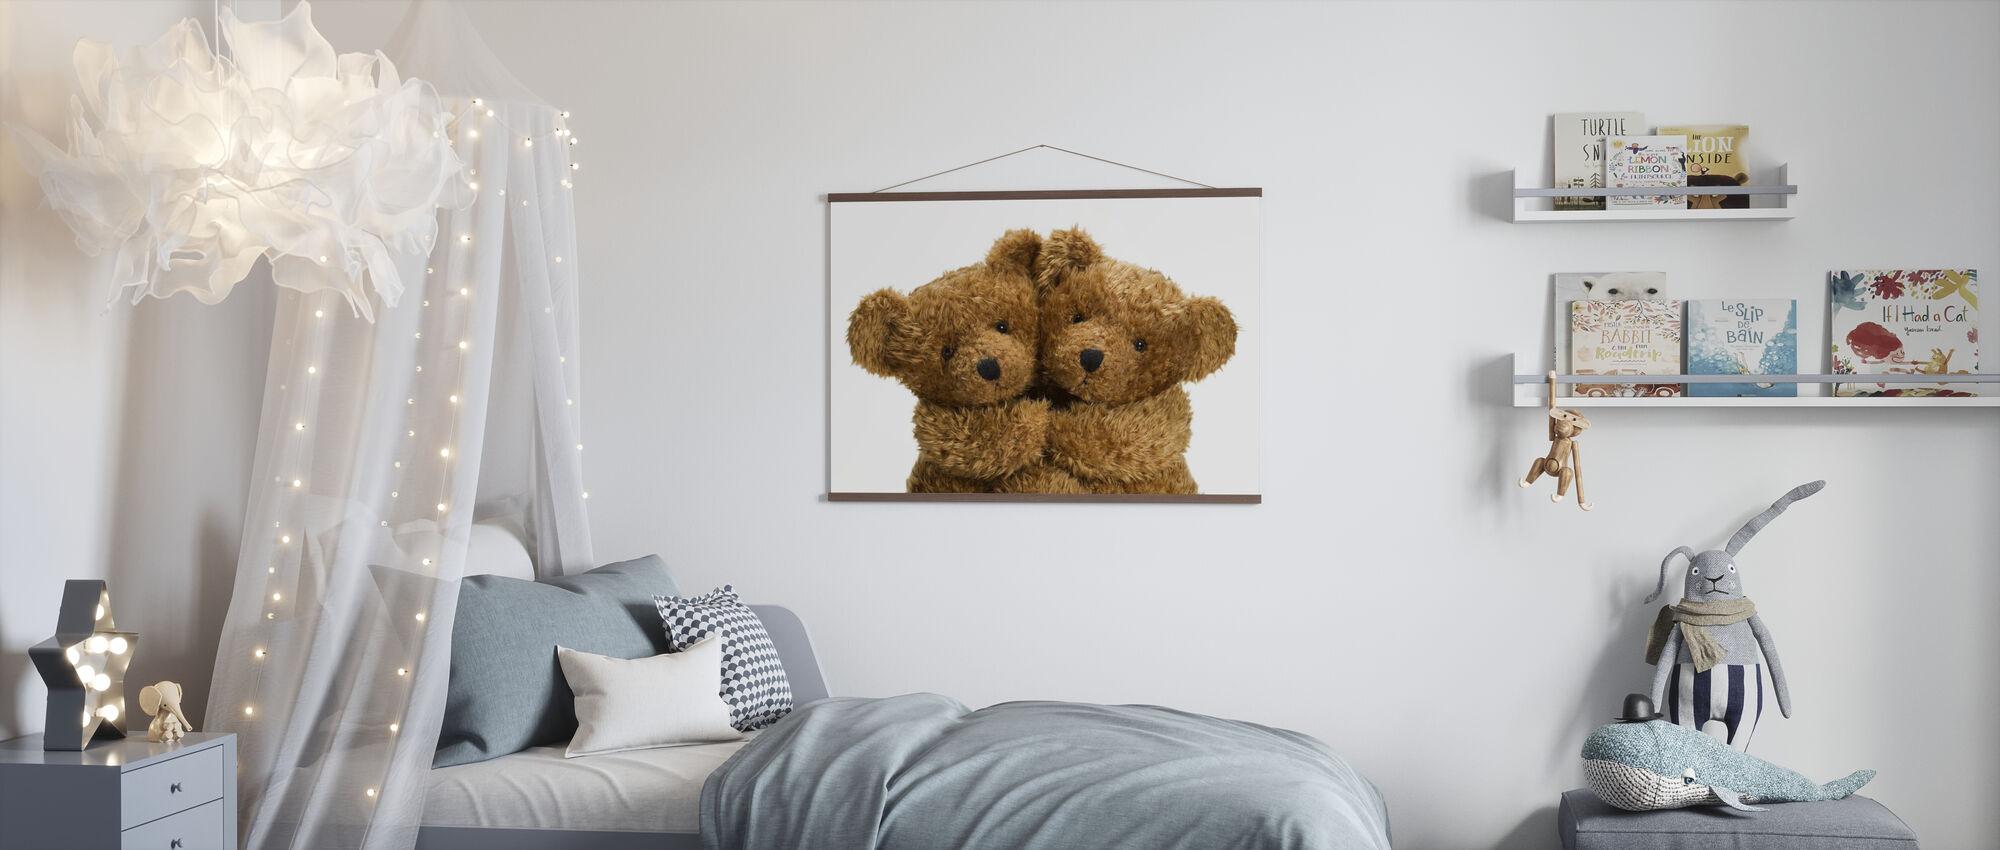 Cuddling Teddy Bears - Poster - Kids Room